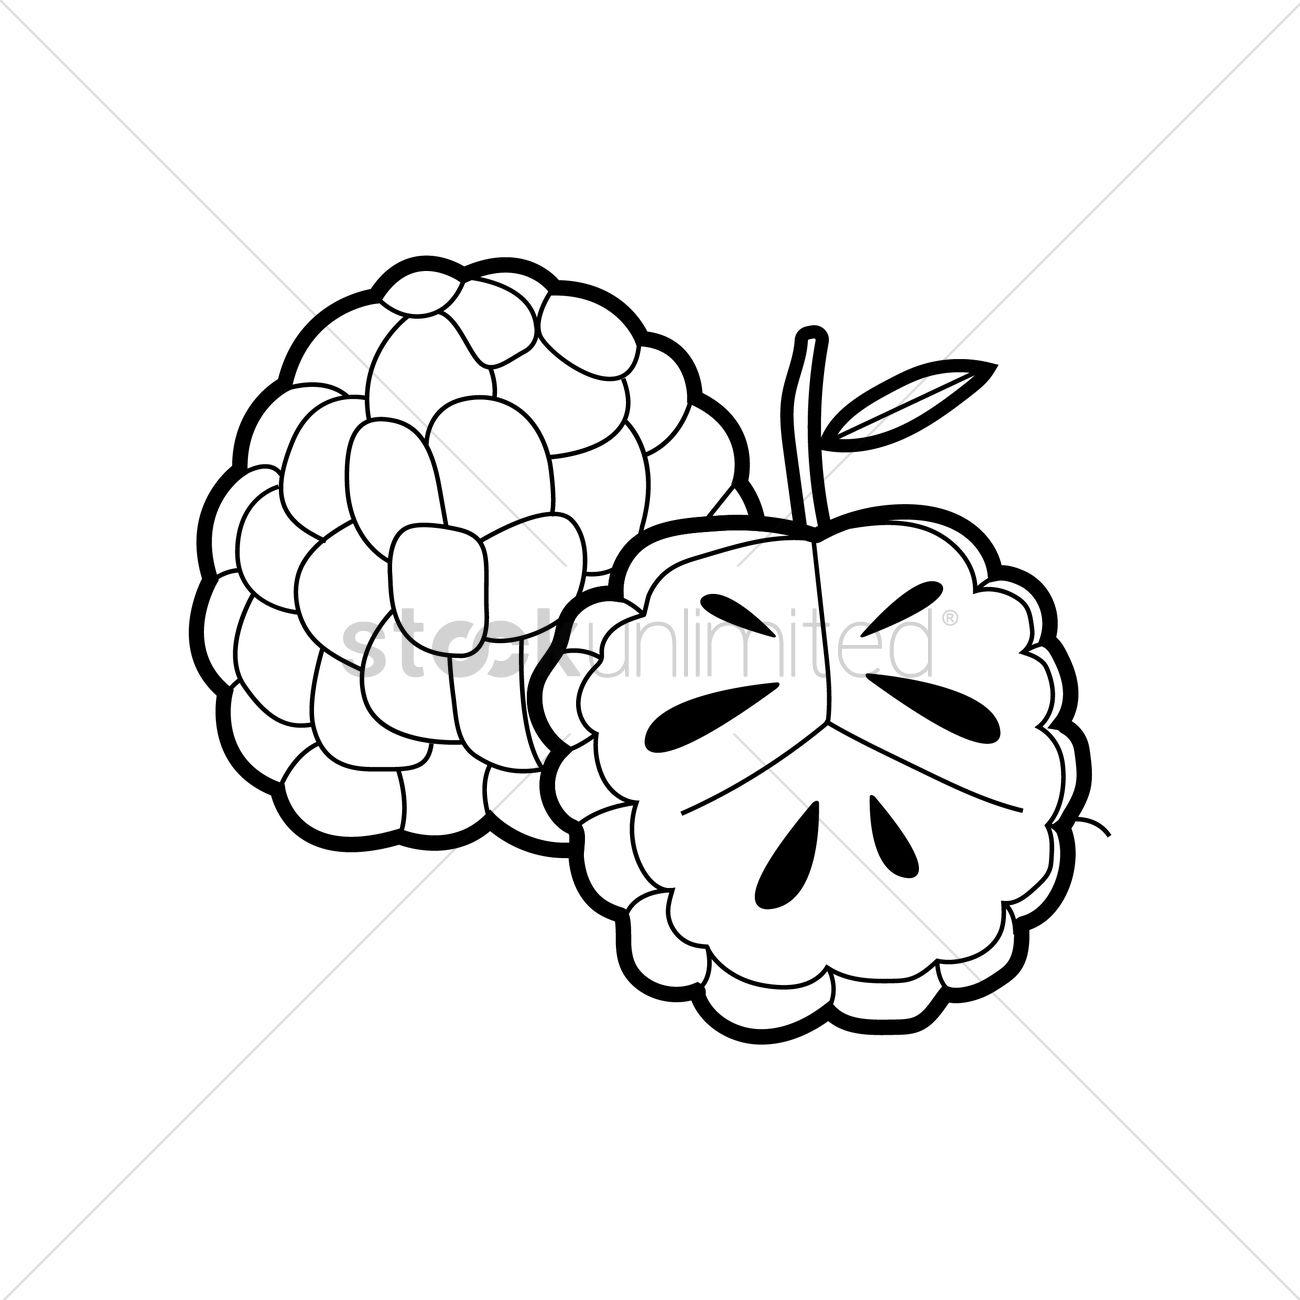 Custard apple Vector Image.